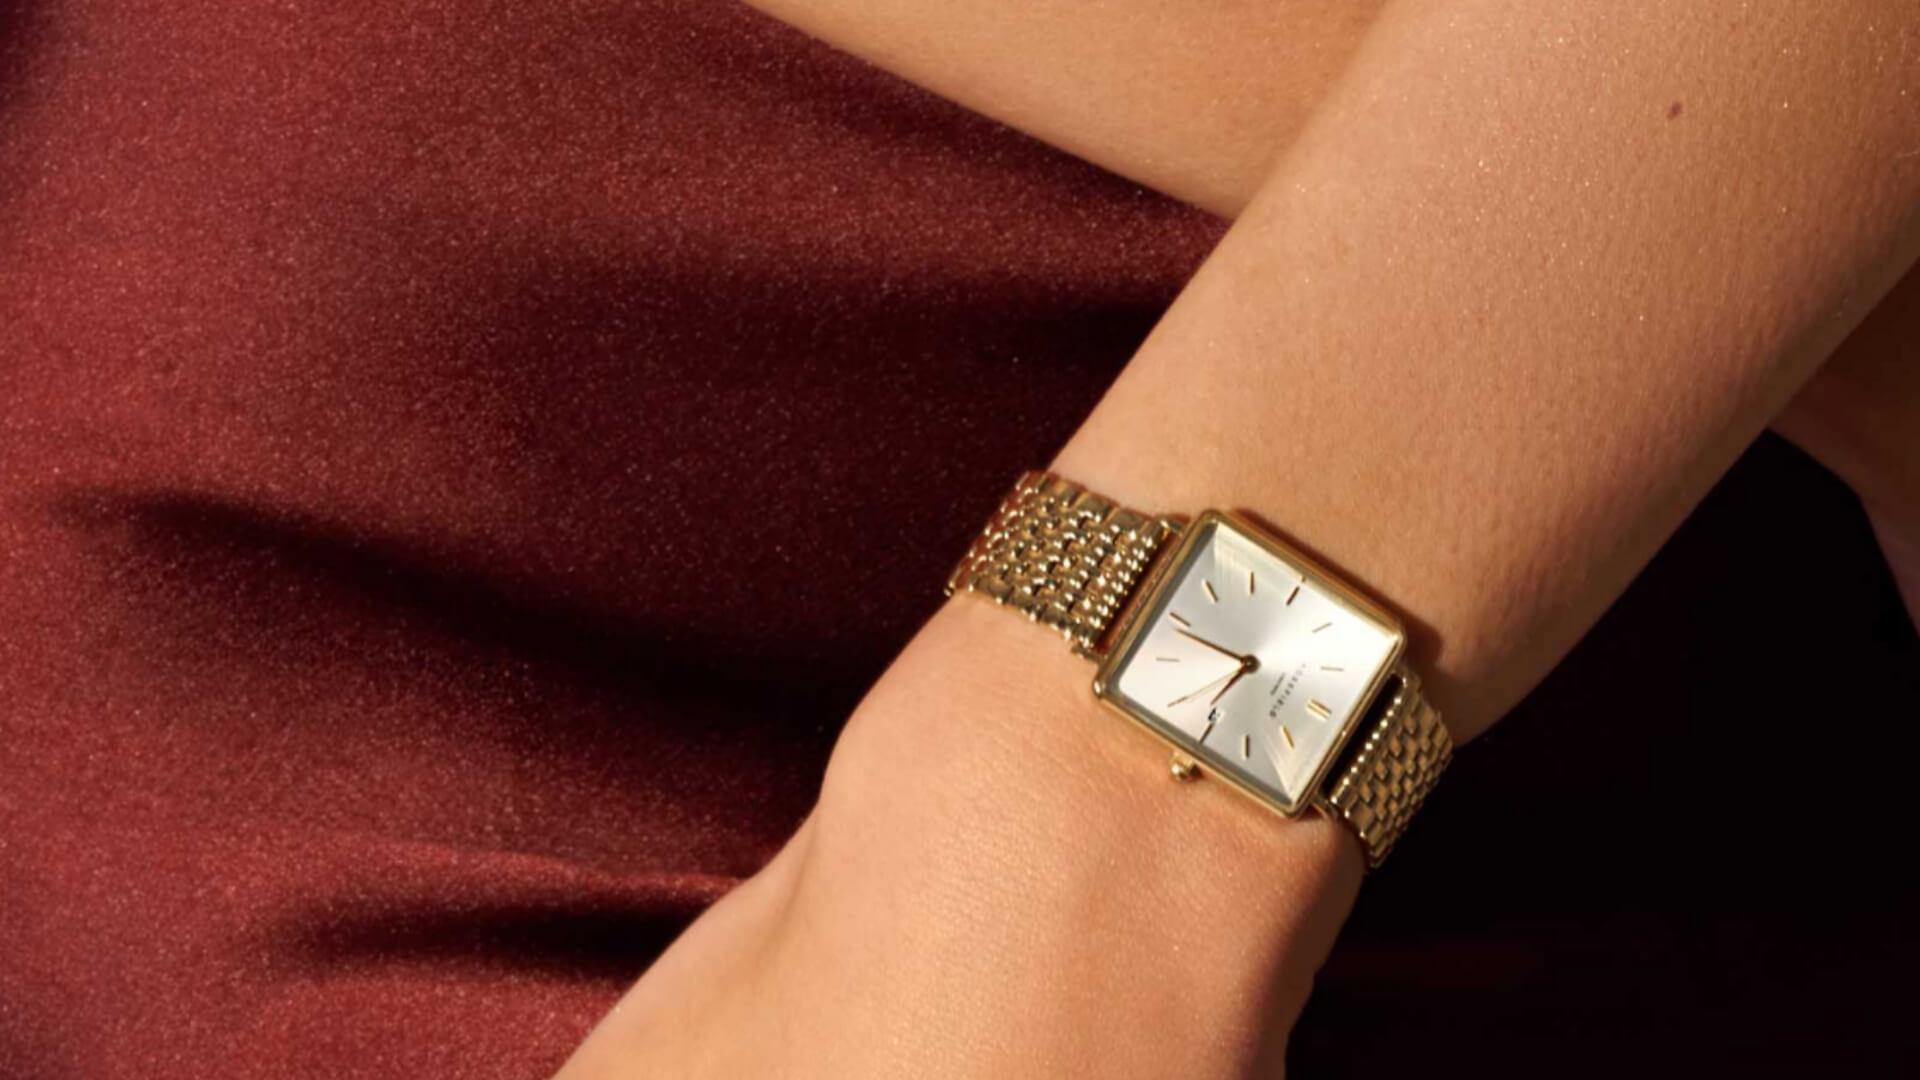 Rosefield watch Boxy on wrist | Code